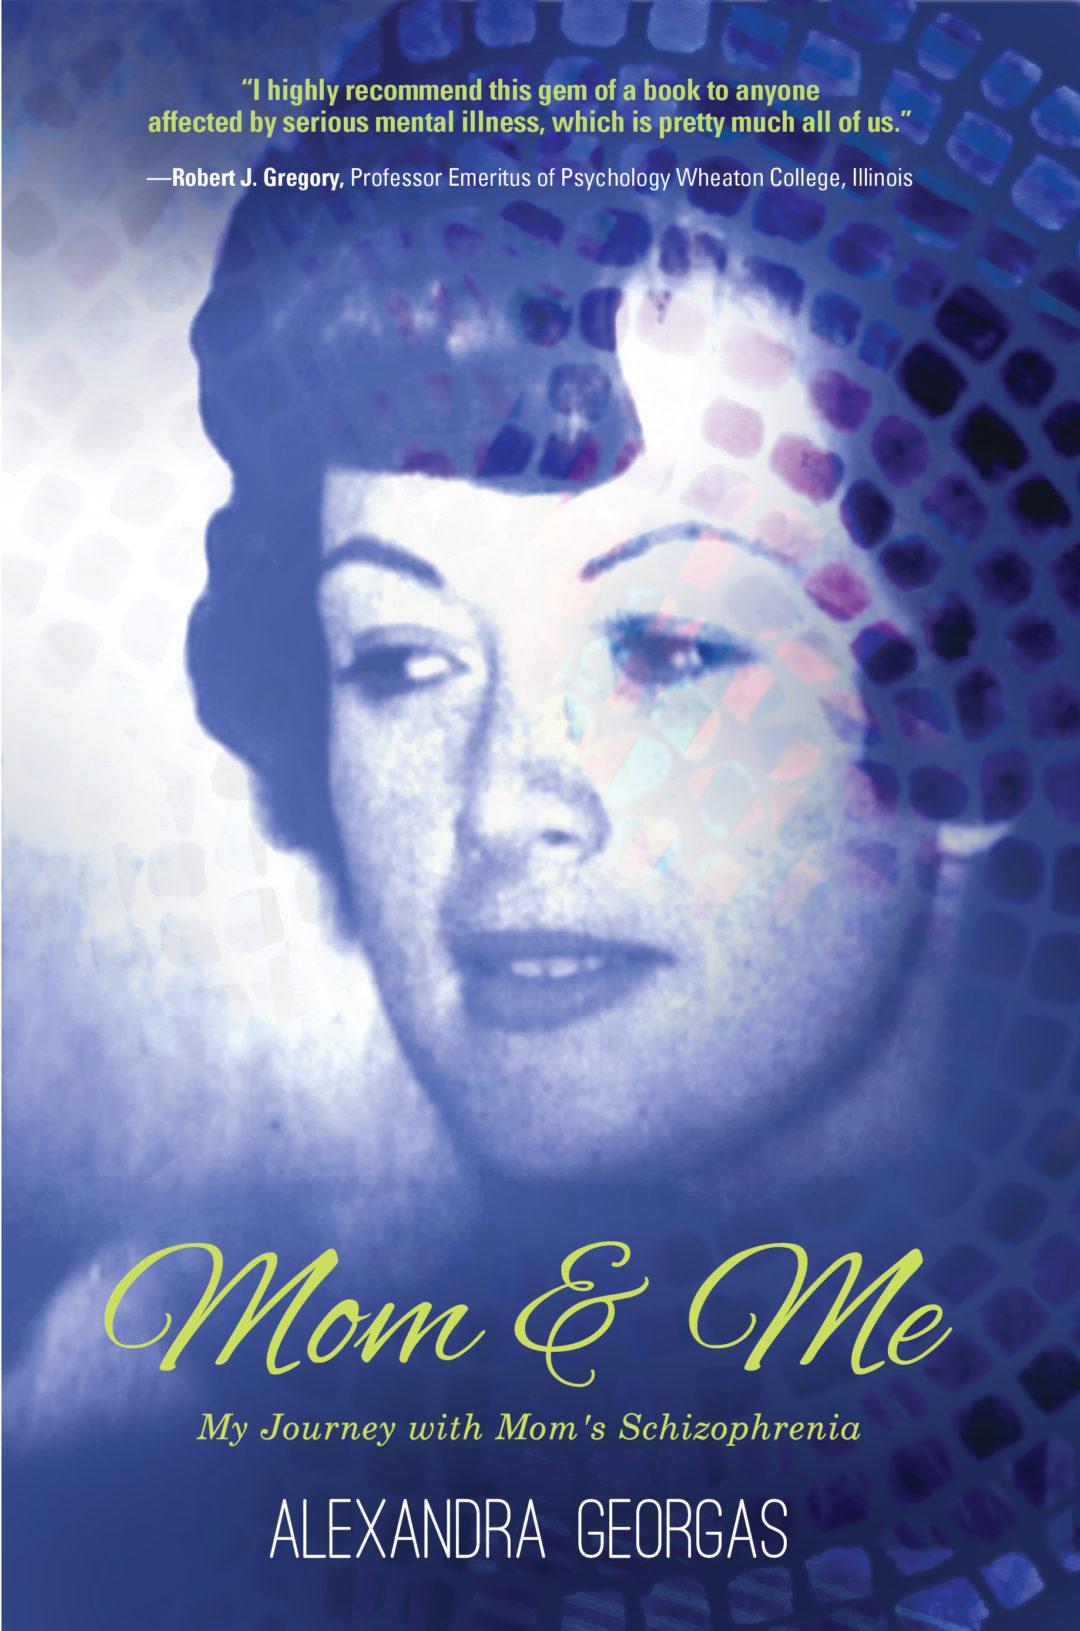 Mom and Me—My Journey with Mom's Schizophrenia